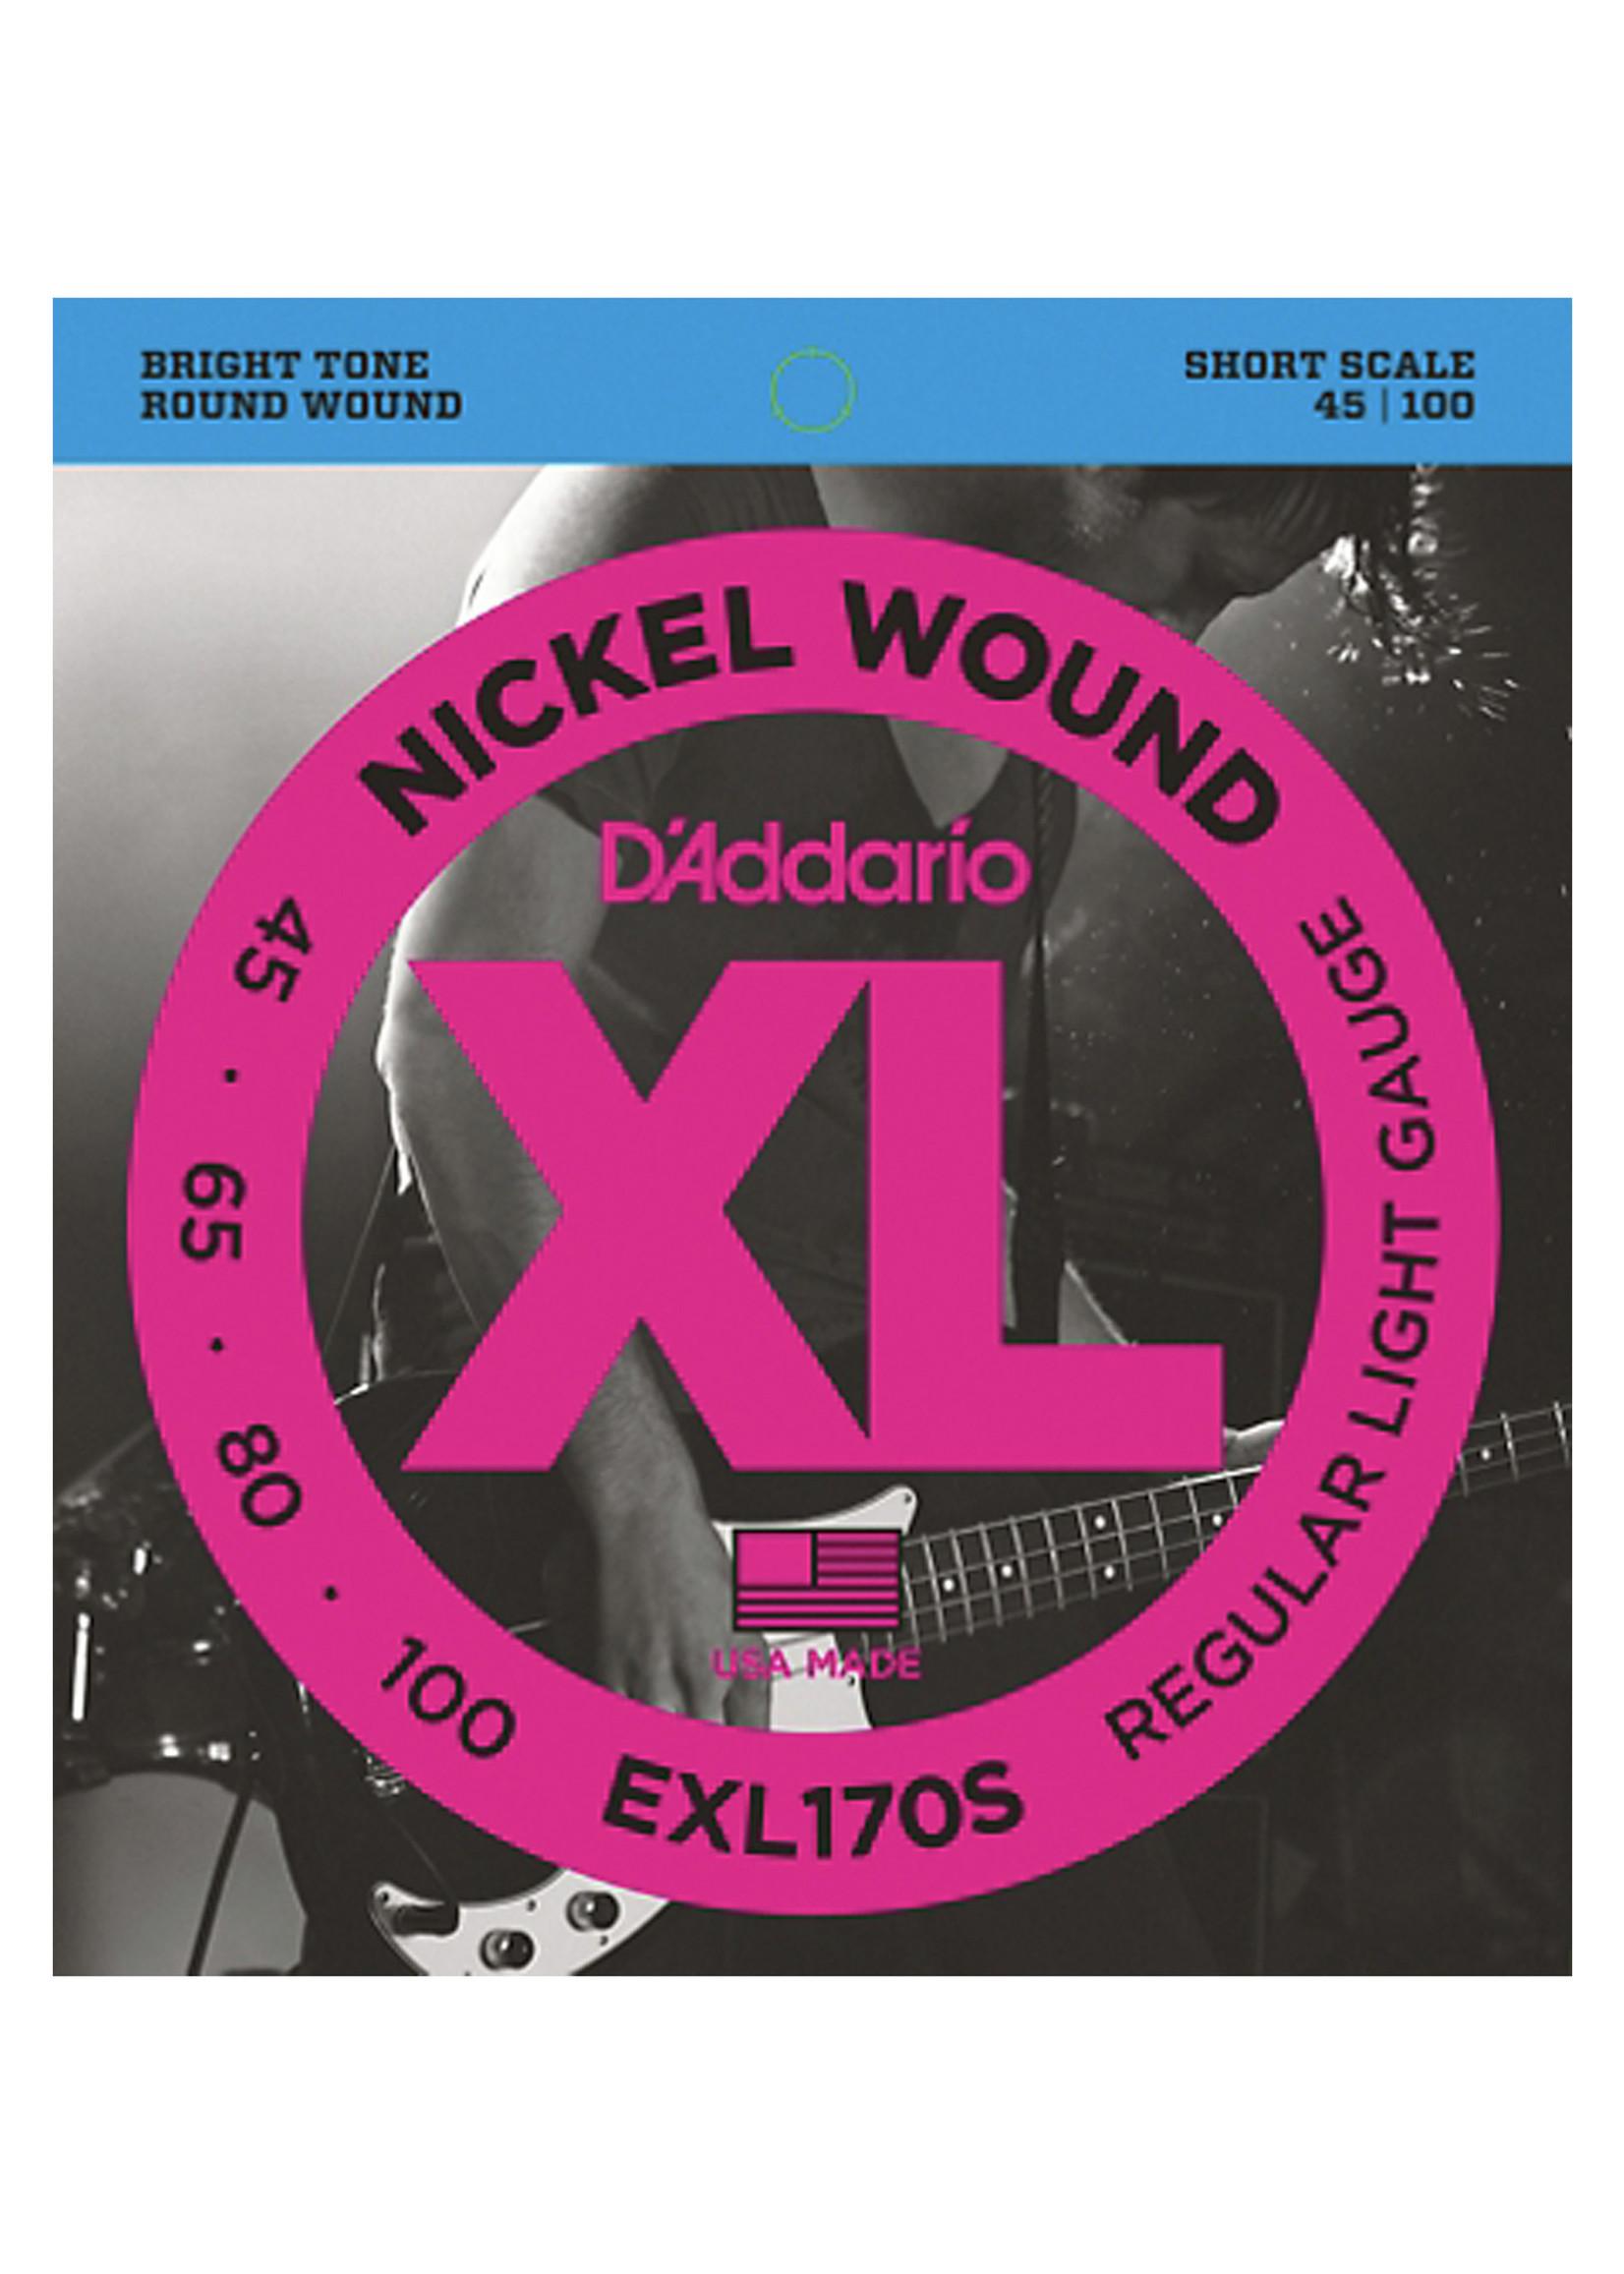 DAddario Fretted D'Addario EXL170s Short Scale, Light 45-100